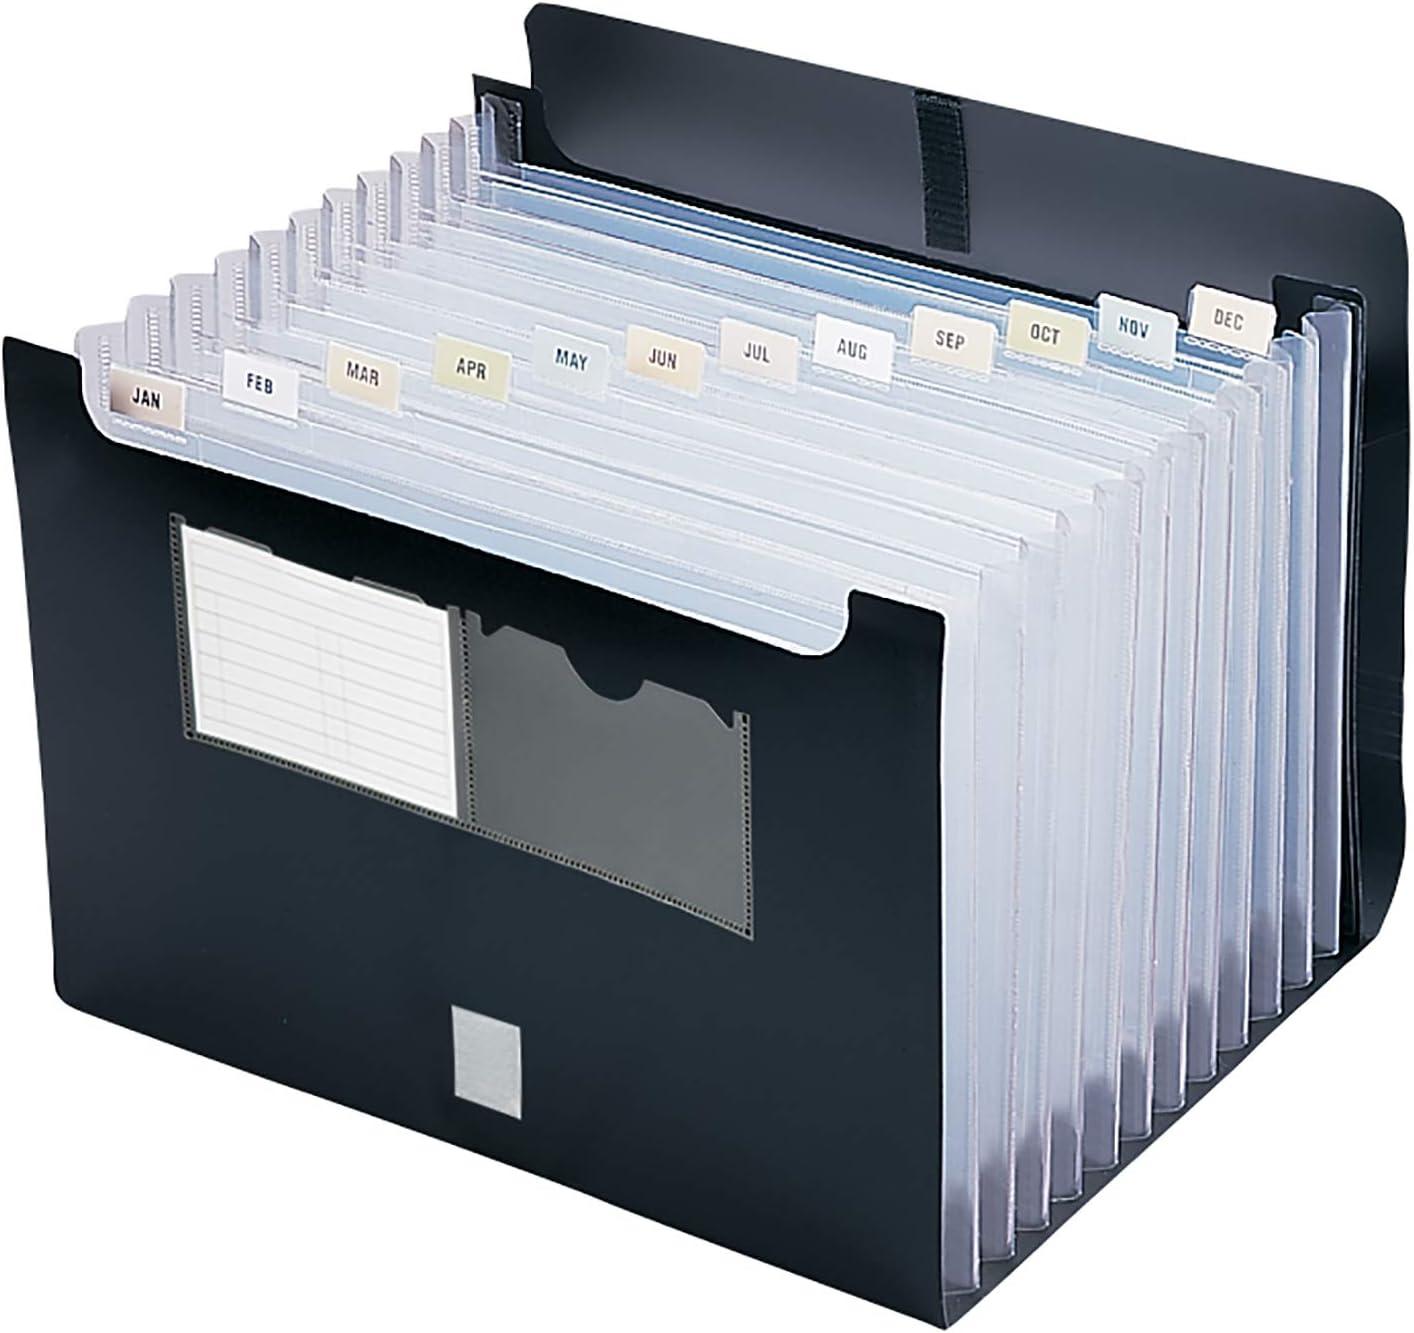 Smead Poly Desktop Expanding File, 12 Pockets, Flap and Cord Closure, Letter Size, Black (70845)